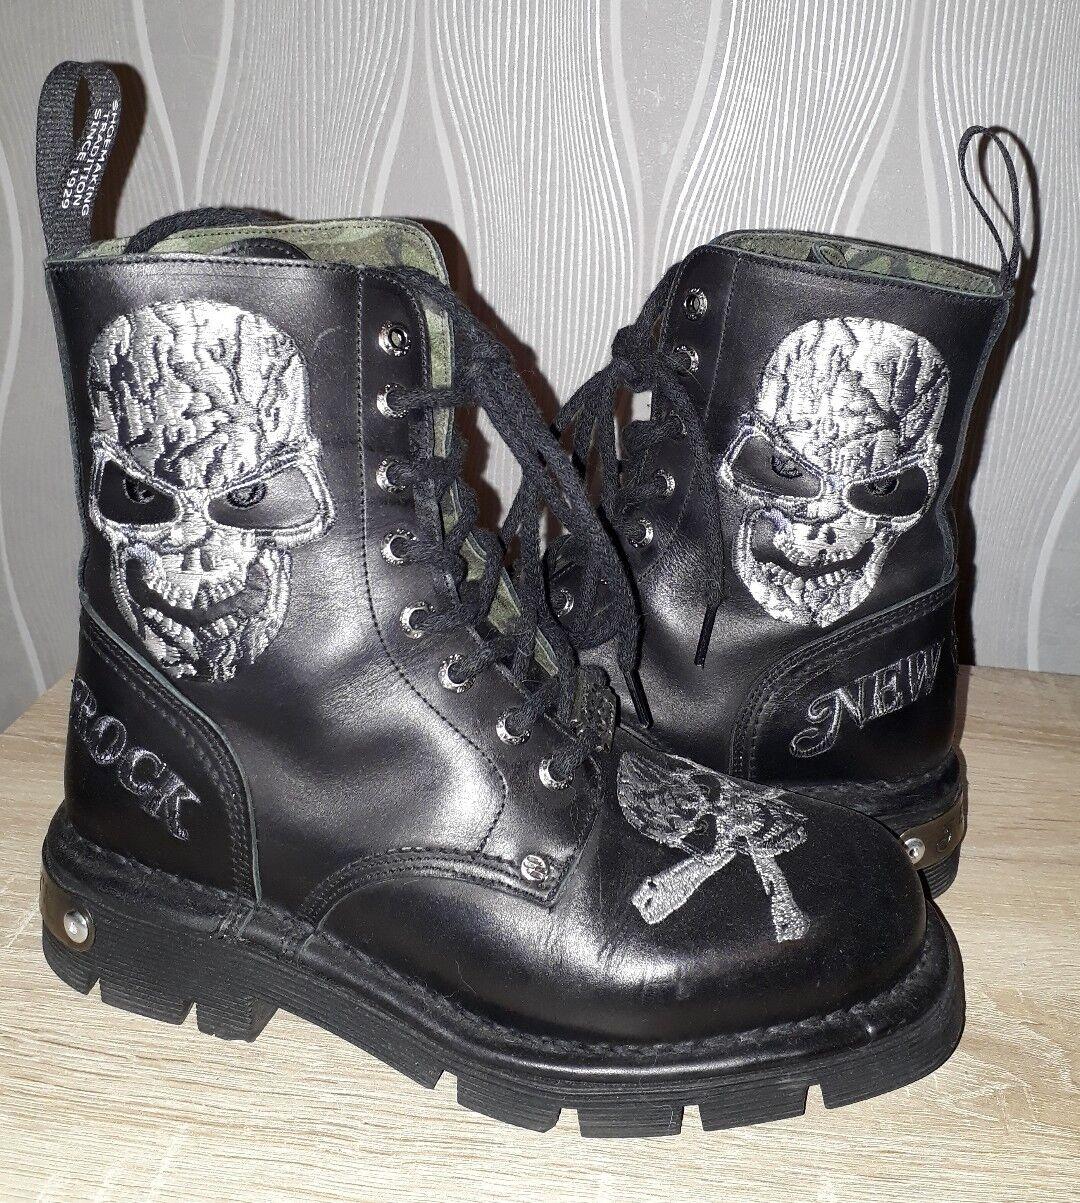 New Rock Stiefel 38,schwarz 38,schwarz 38,schwarz ,Skull 284596